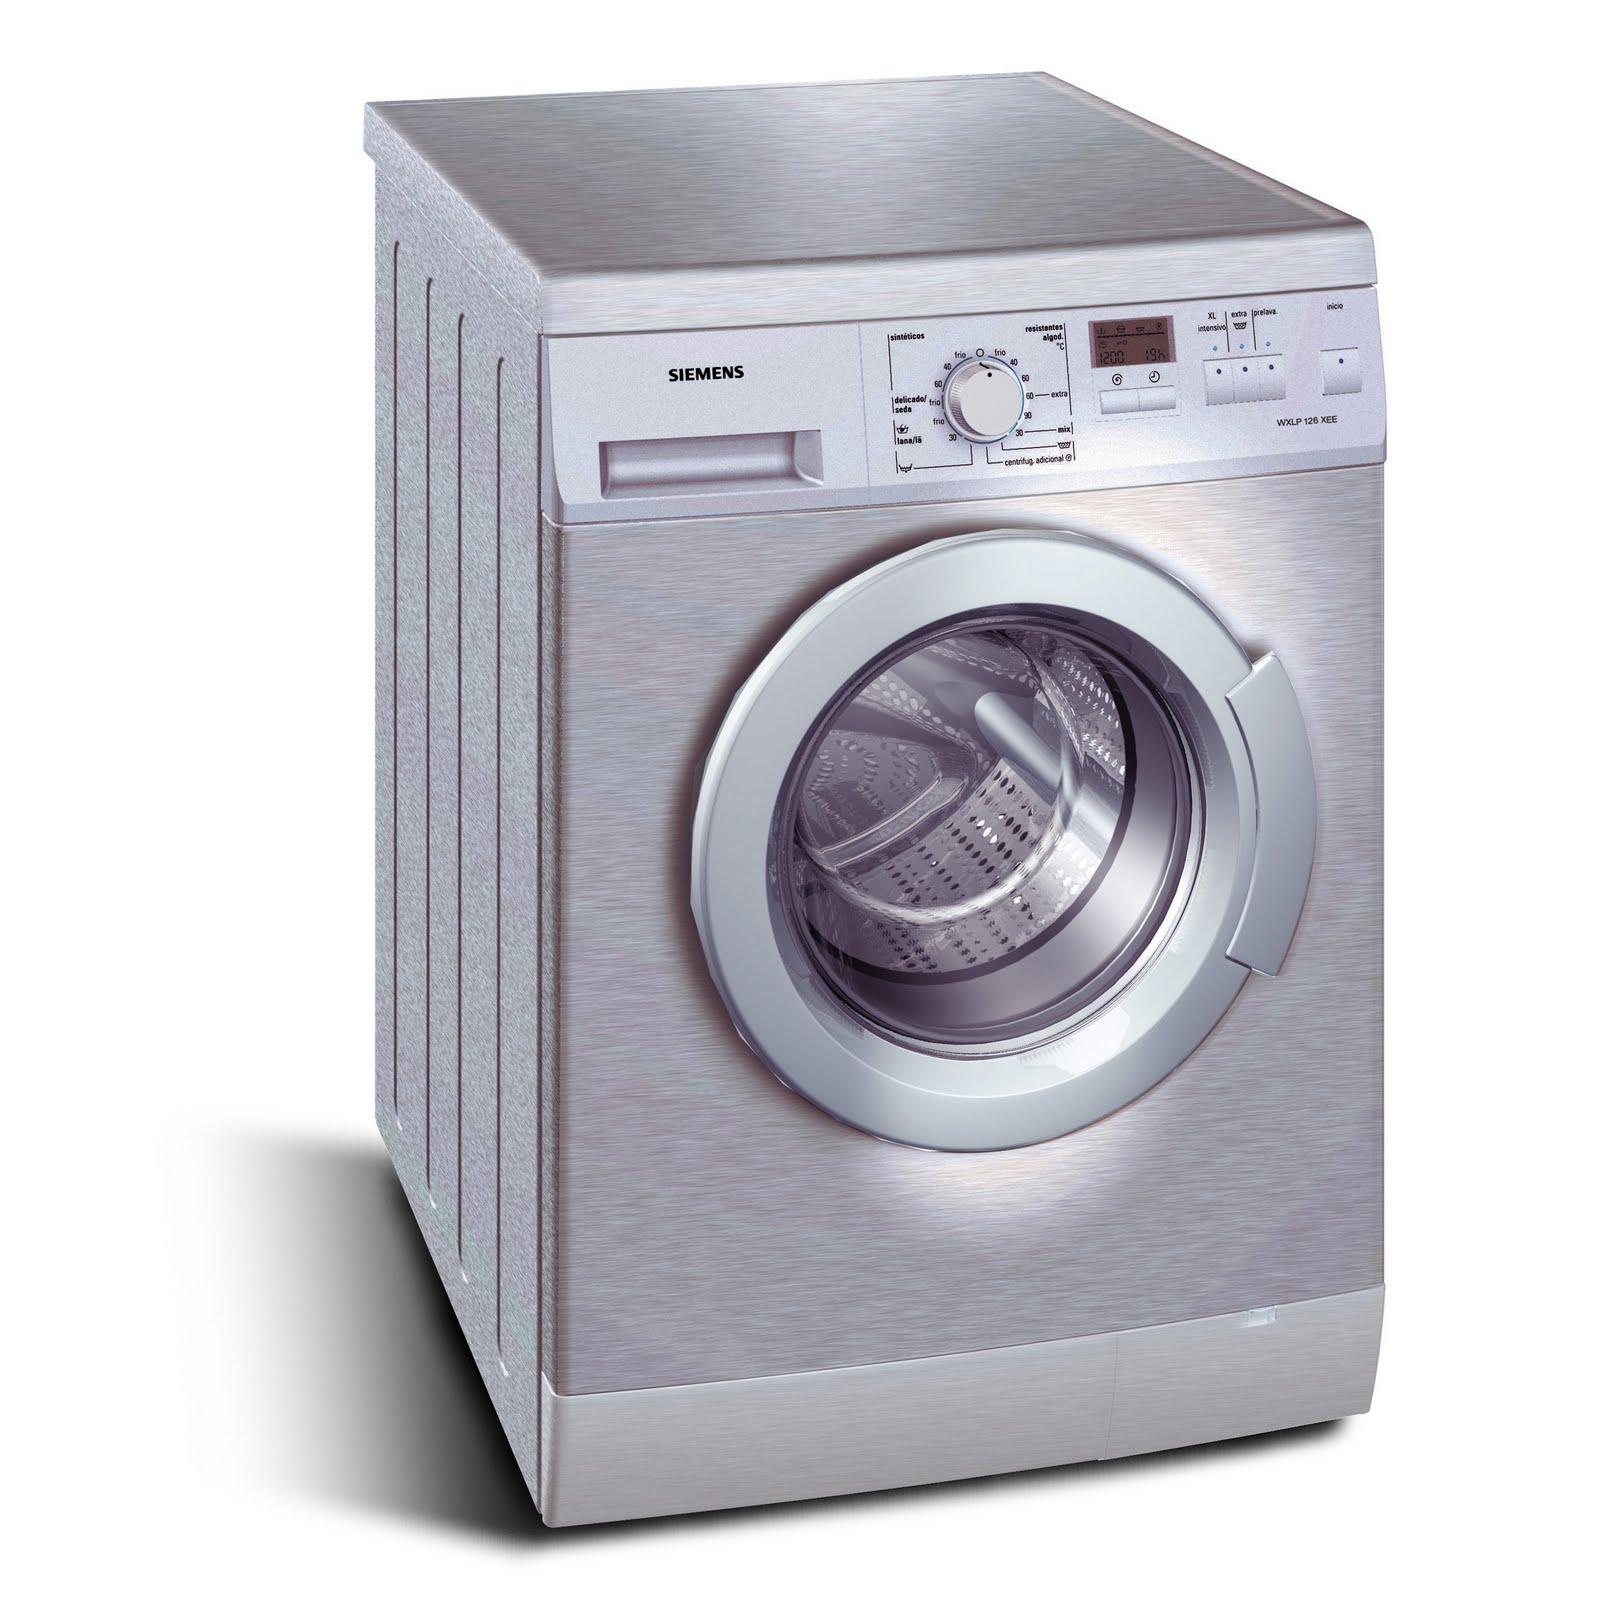 Incaem ayaso caja y lavadora decorada con diferentes motivos for Fotos de lavadoras